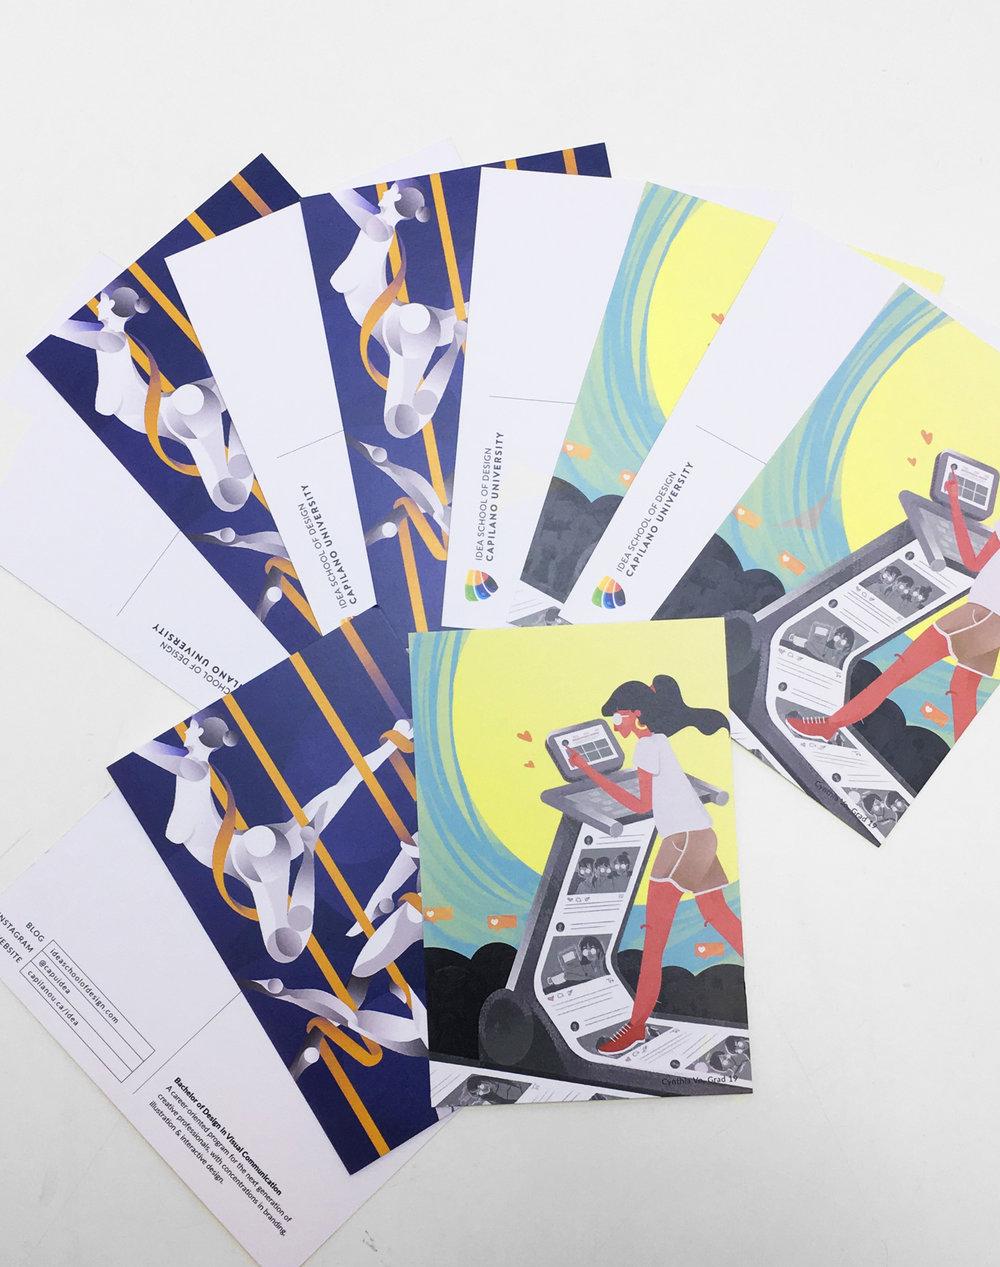 intertwine--capilano-university-postcard-by-design-students-cynthia-tran-vo3.jpg